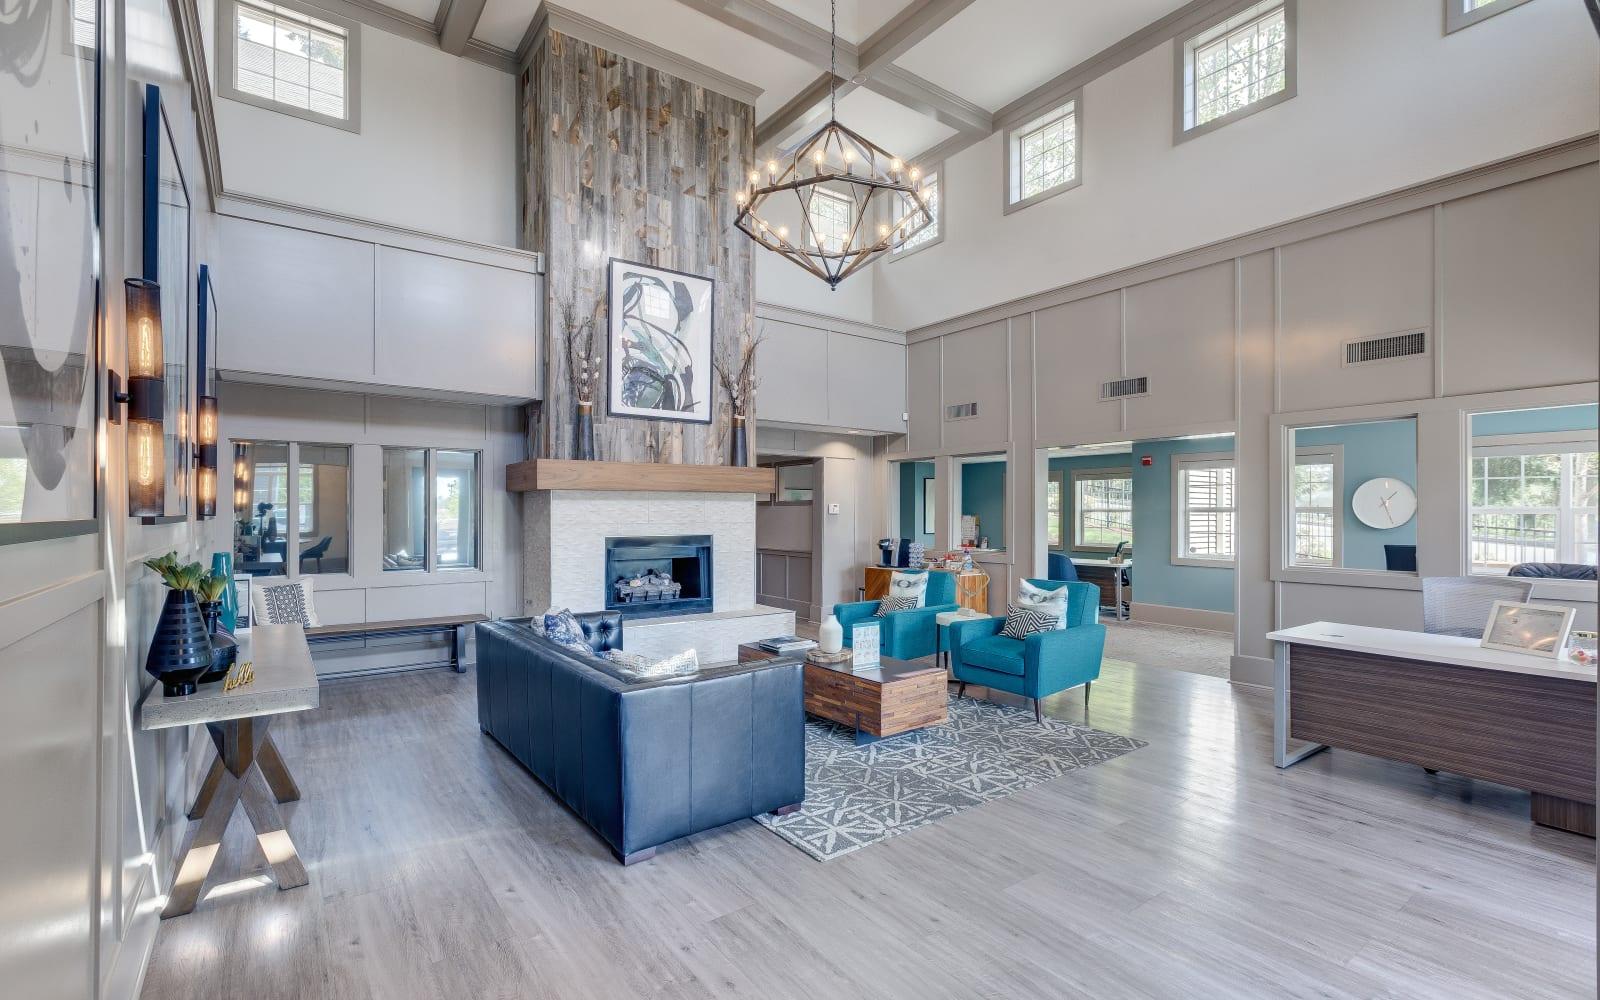 Spacious open area with plenty of seating at Alaire Apartments in Renton, Washington